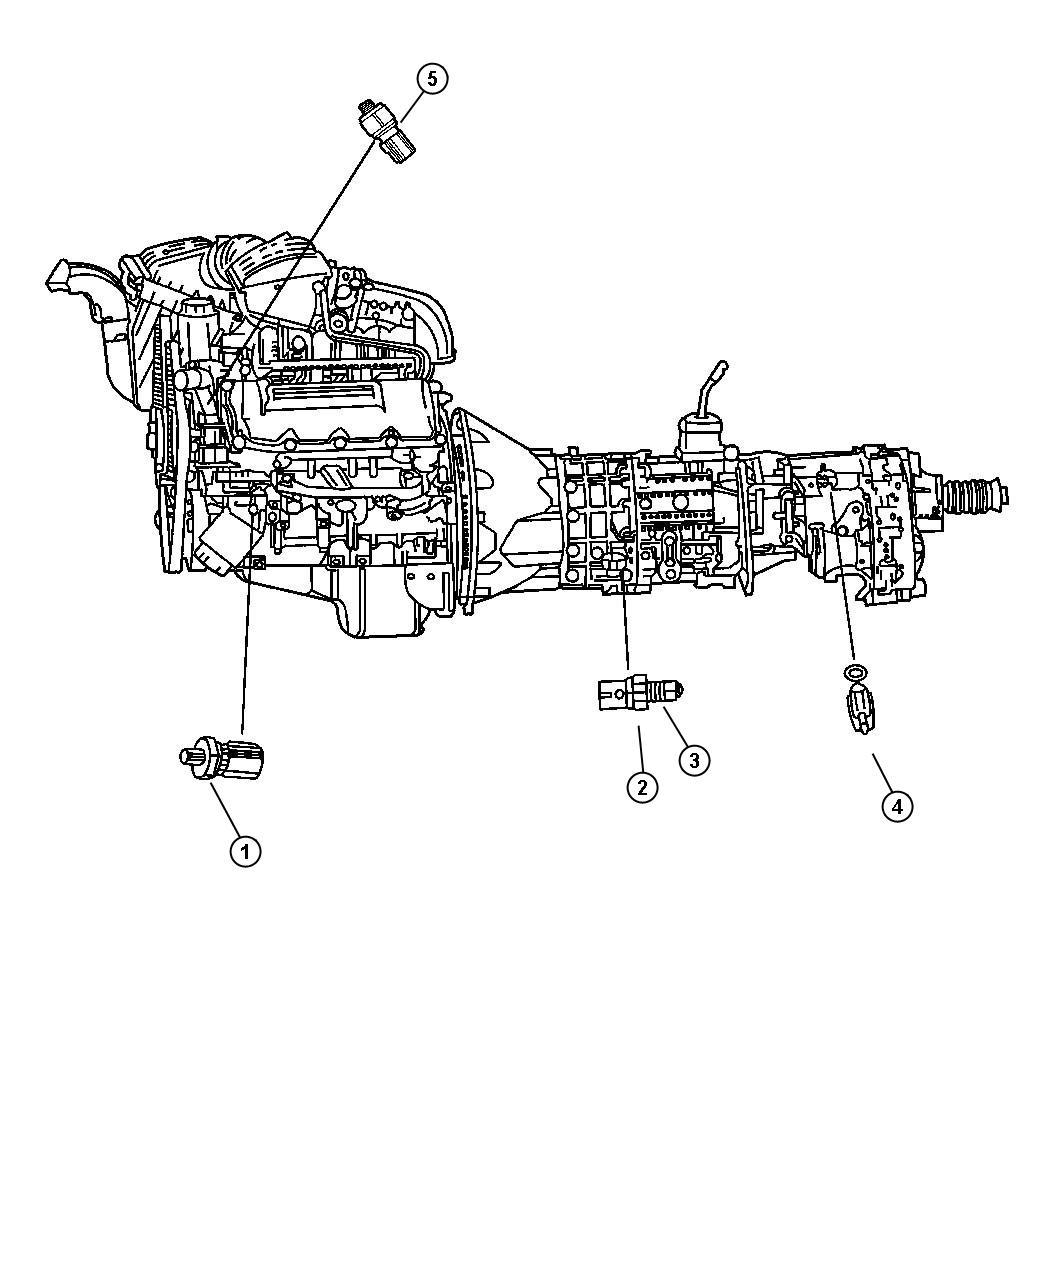 2000 Jeep Grand Cherokee Sending unit, sensor. Oil